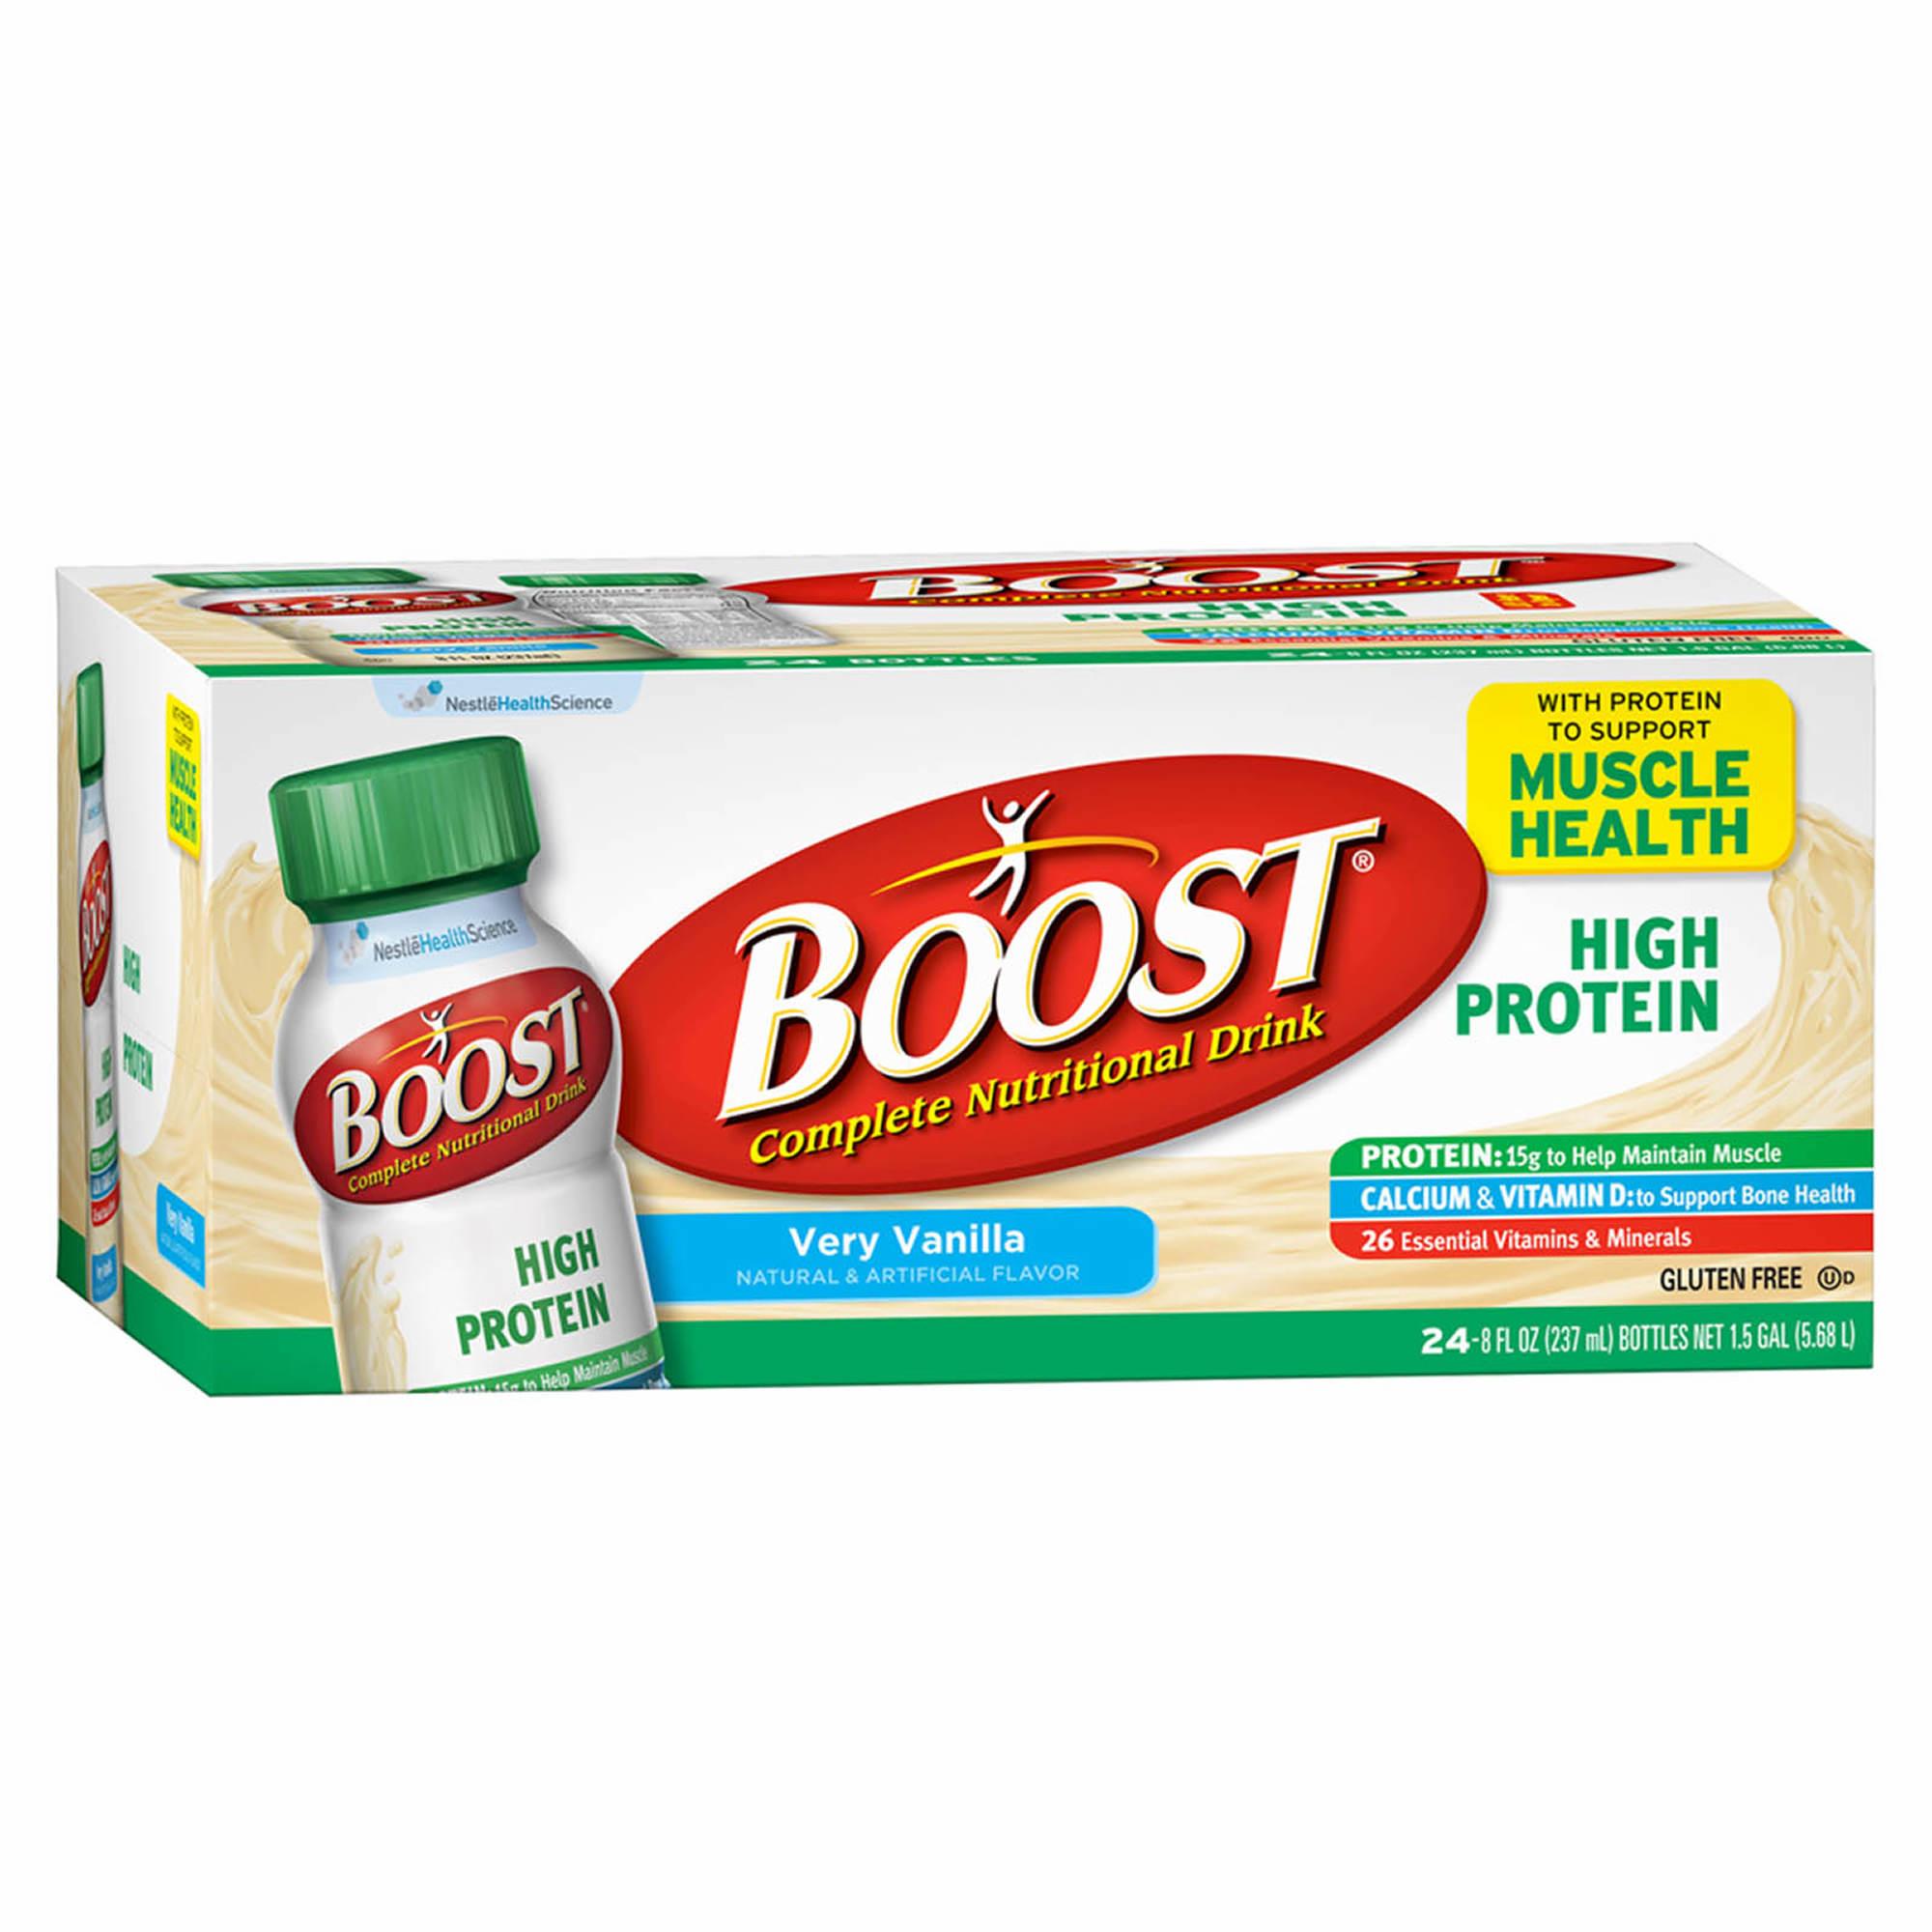 Boost High Protein Energy Drink 8 Oz: Boost High-Protein Drink, Vanilla, 24 Pk./8 Oz.